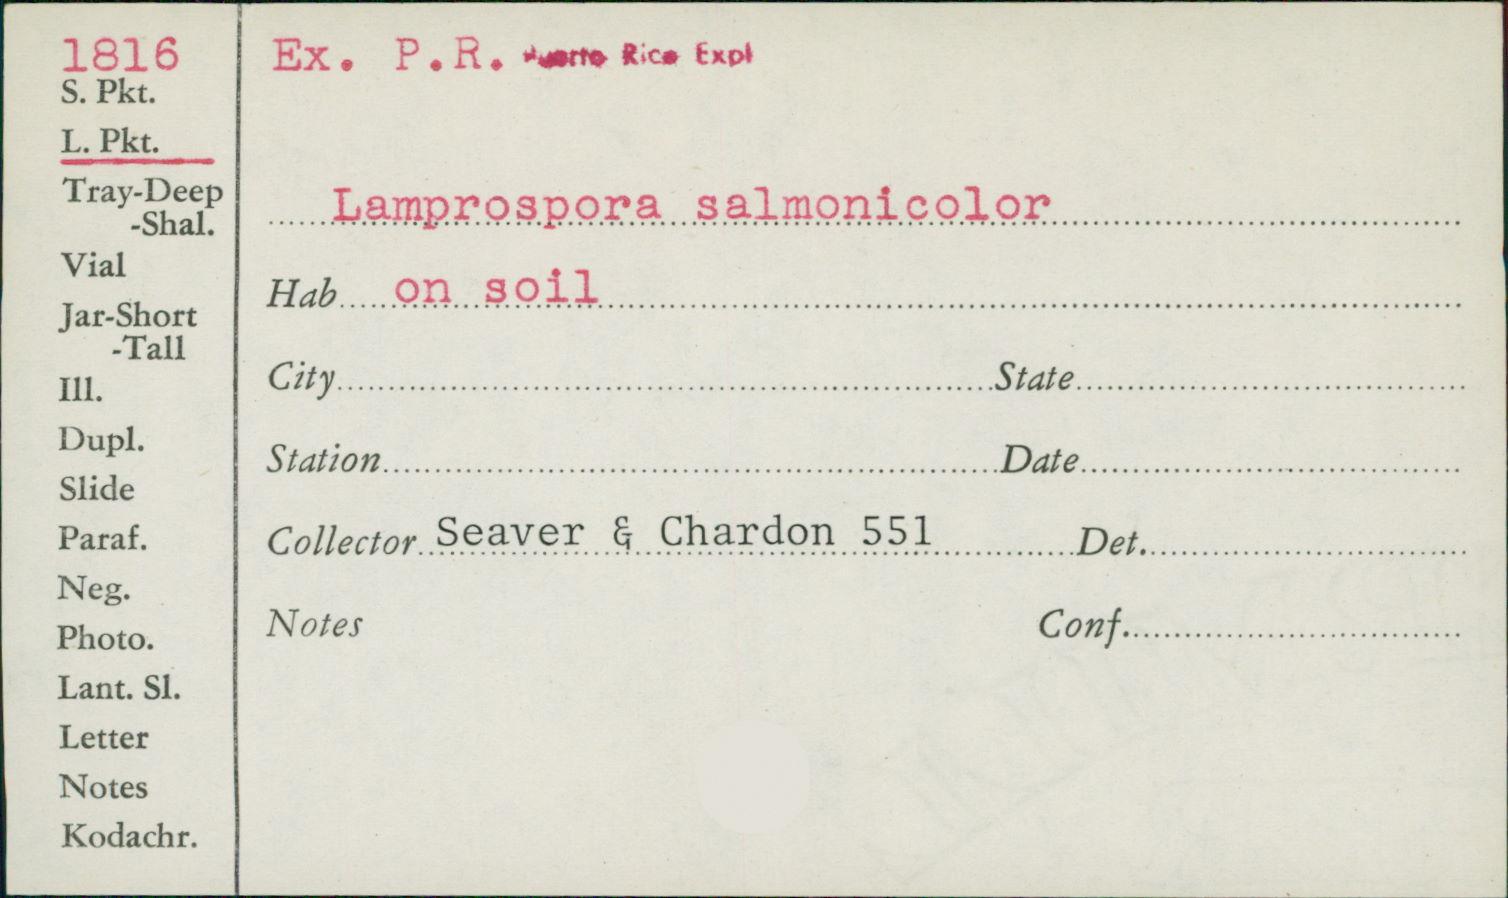 Lamprospora salmonicolor image